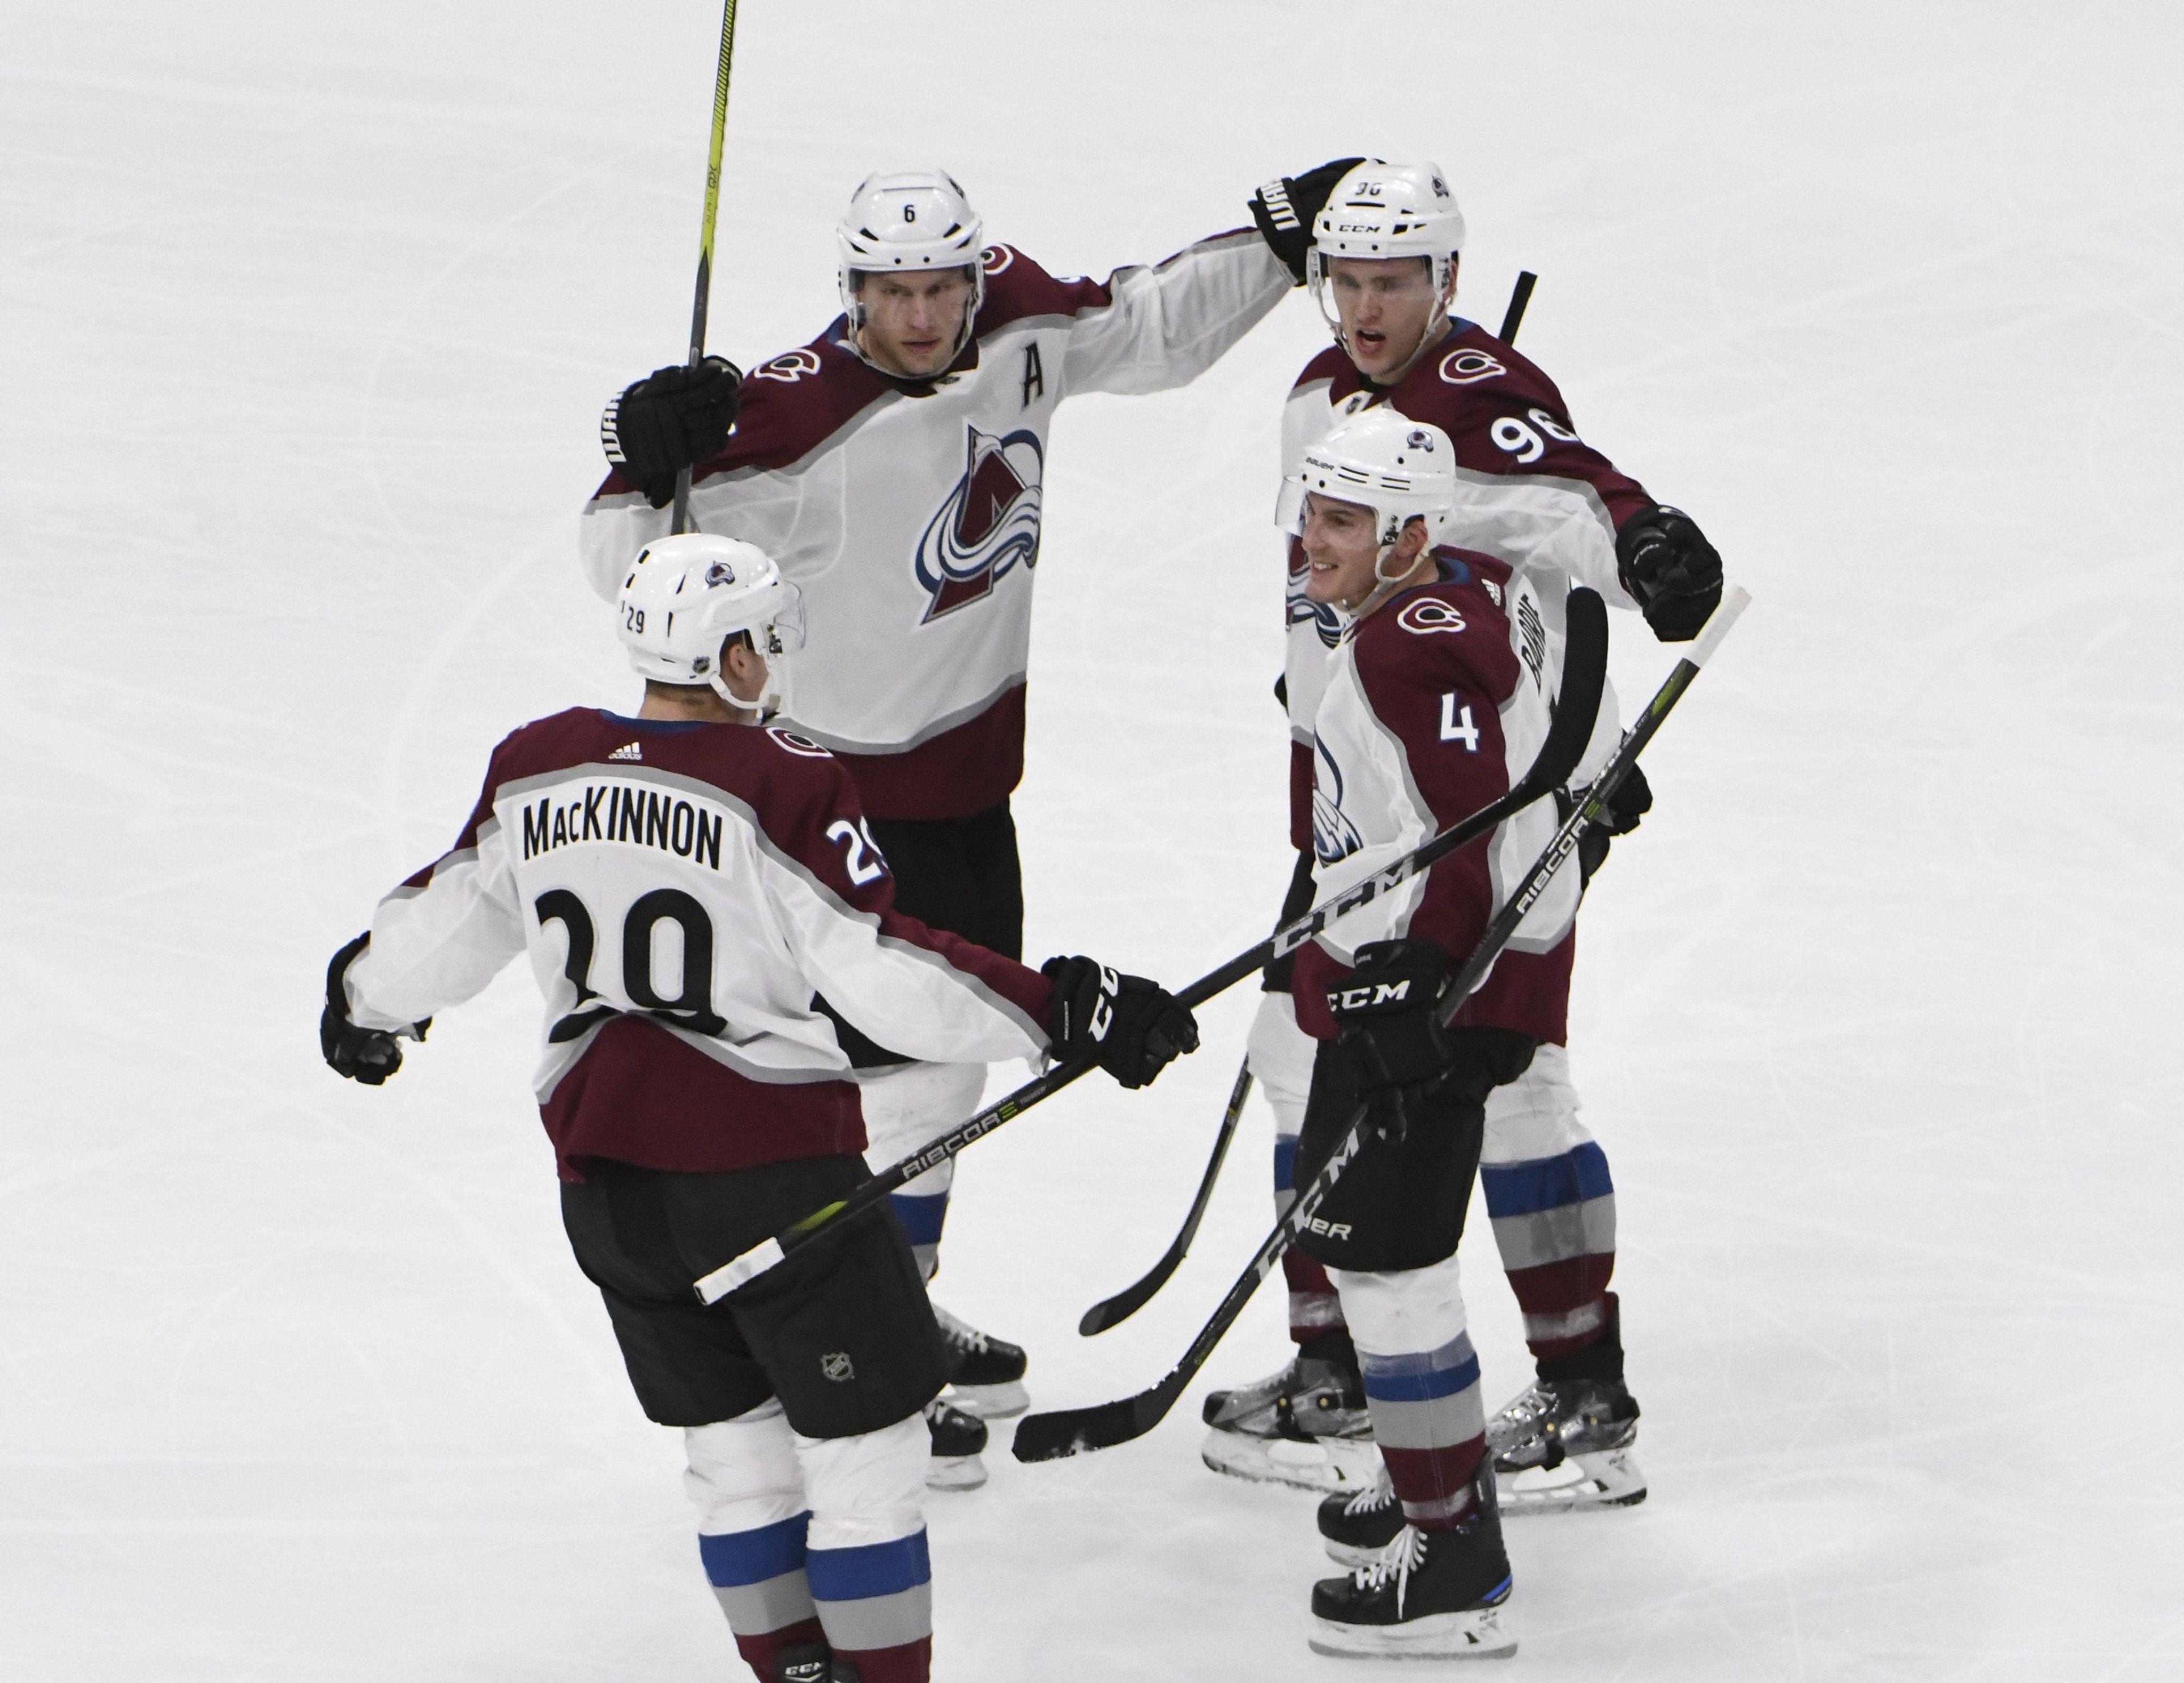 Avalanche_blackhawks_hockey_15611_s4096x3157